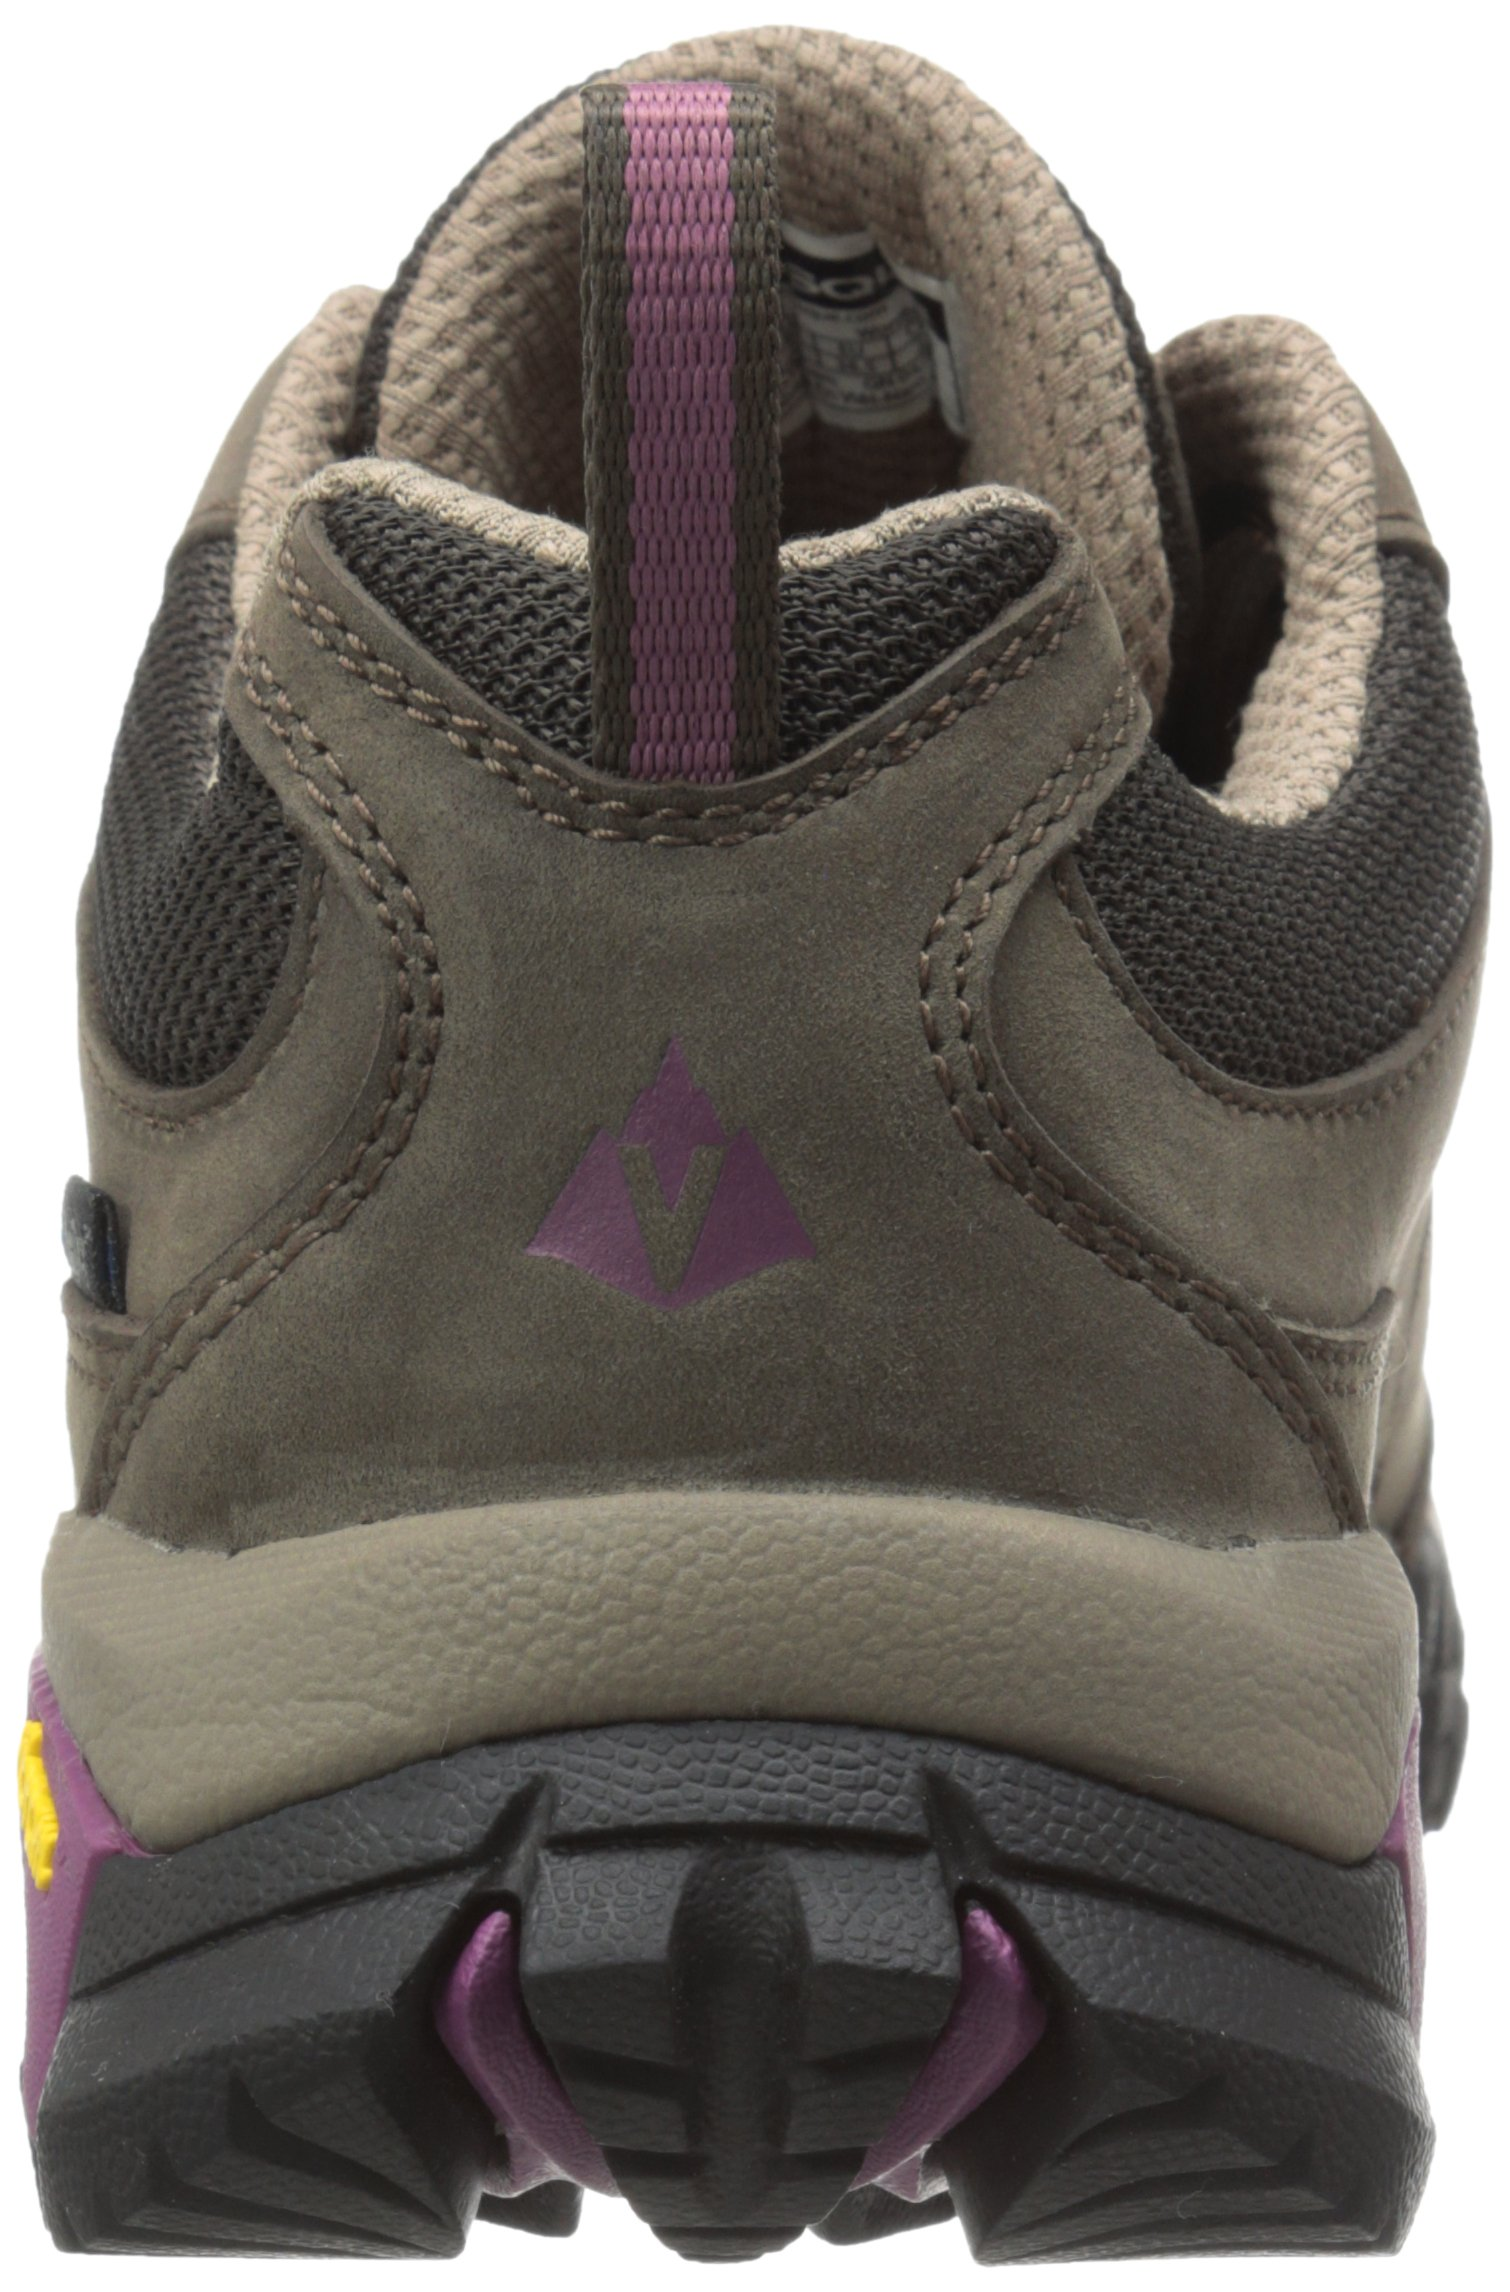 Vasque Women's Talus Trek Low UltraDry Hiking Shoe, Black Olive/Damson, 8.5 M US by Vasque (Image #2)